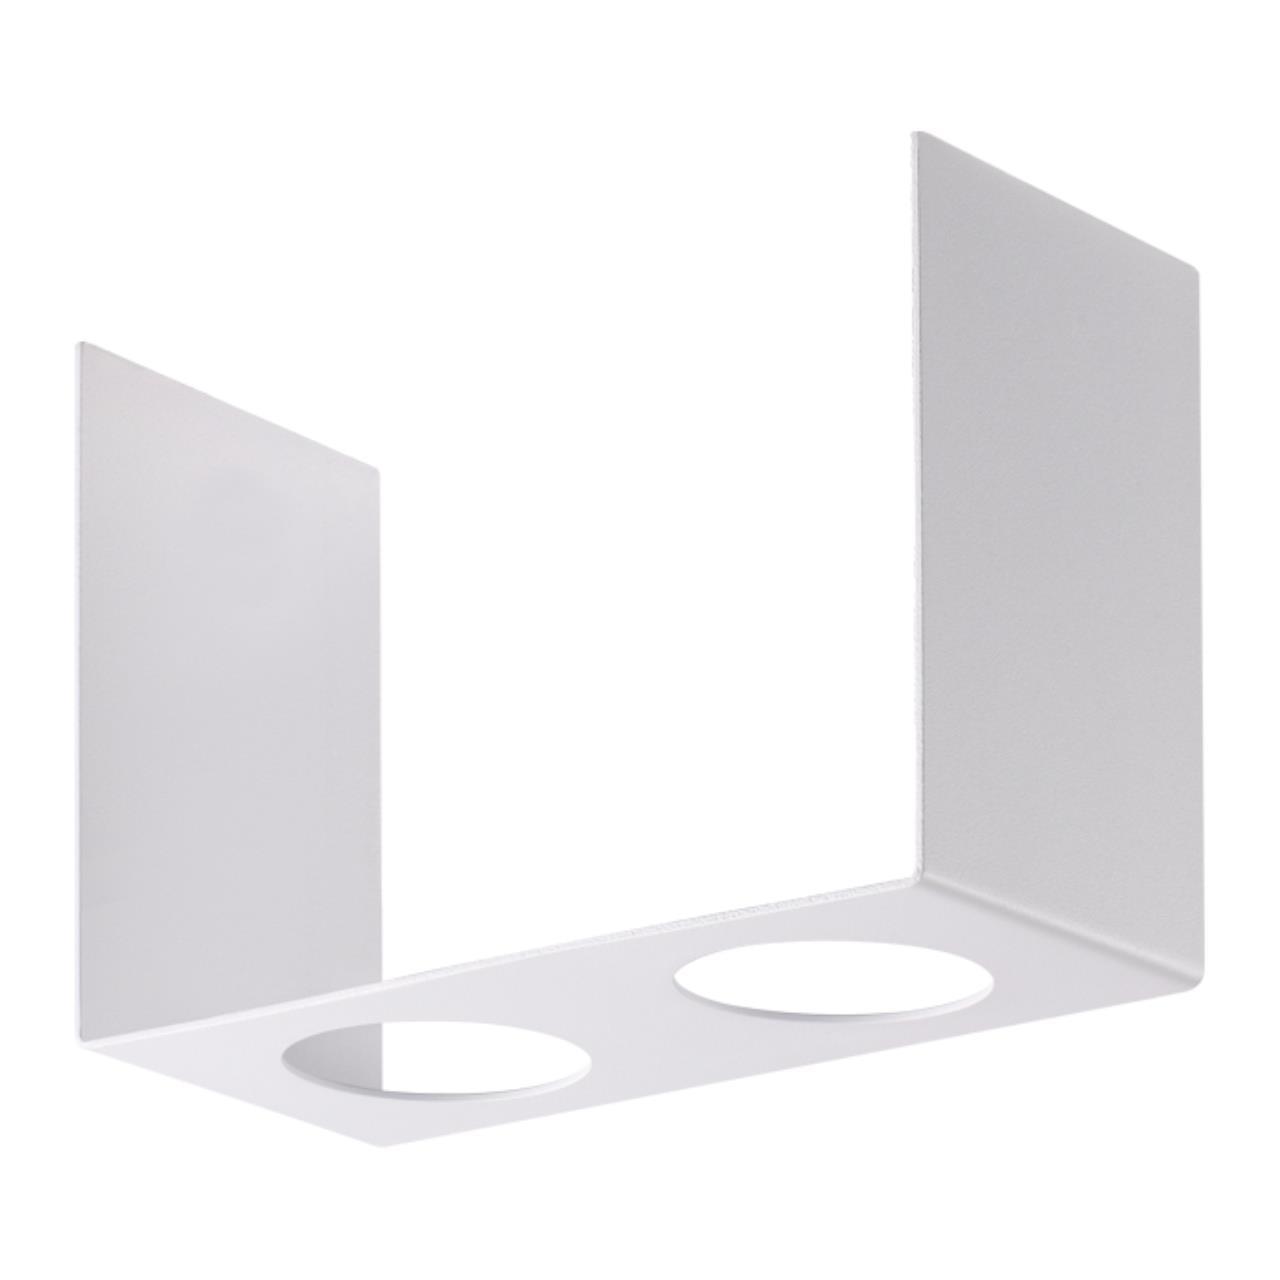 370508 KONST NT19 035 белый Декоративная рамка к артикулам 370505, 370506 LEGIO